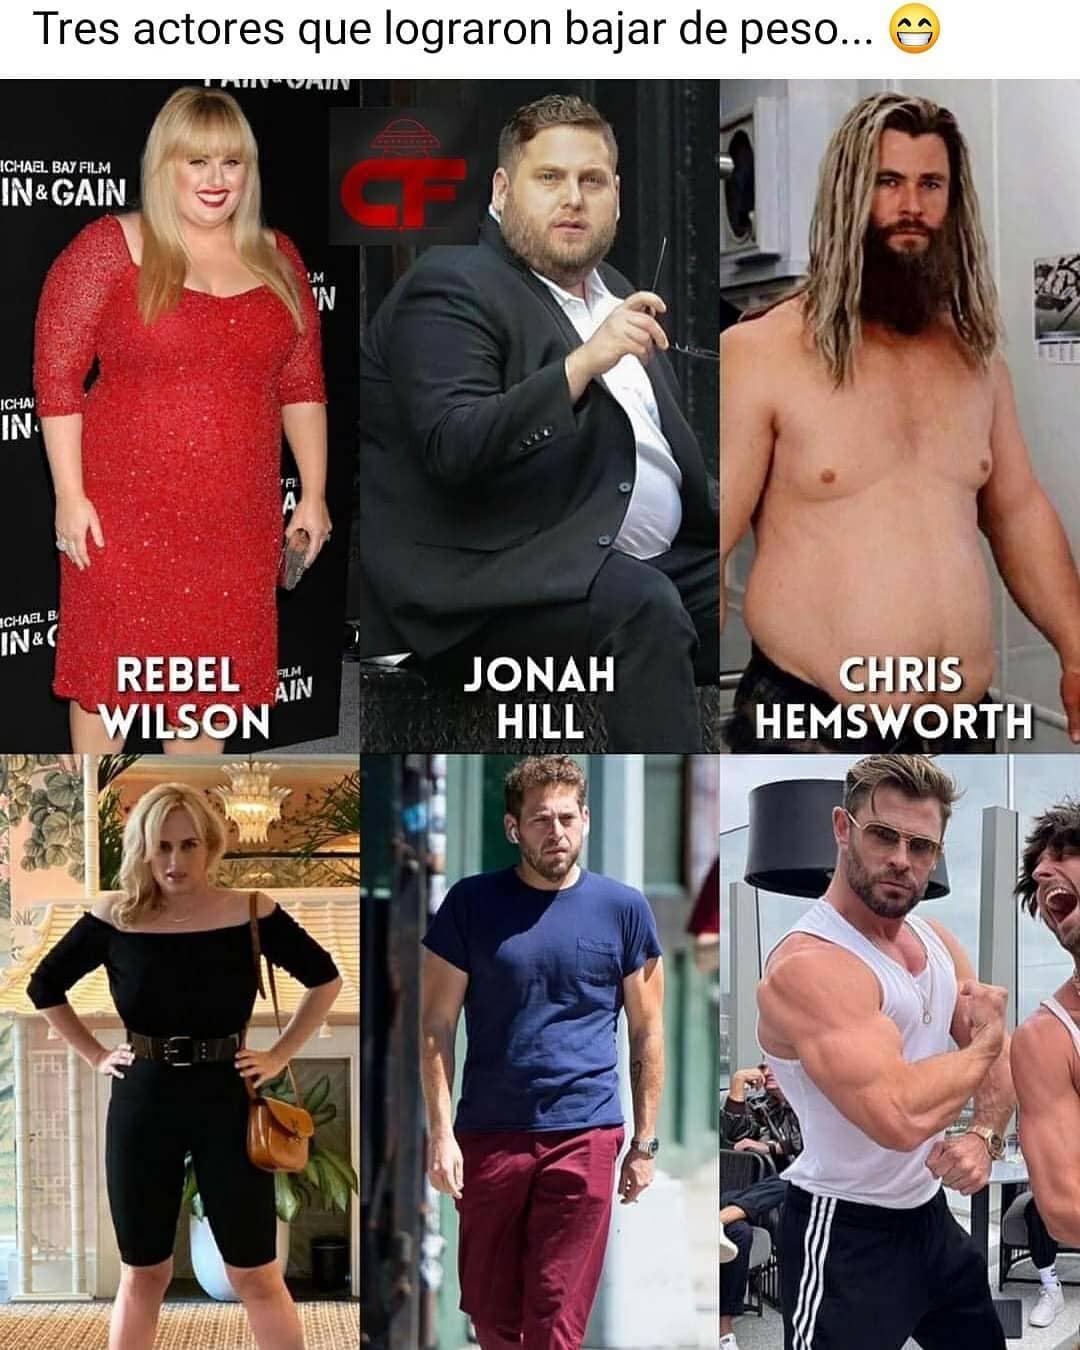 Tres actores que lograron bajar de peso...  Rebel Wilson. Jonah Hill. Chris Hemsworth.